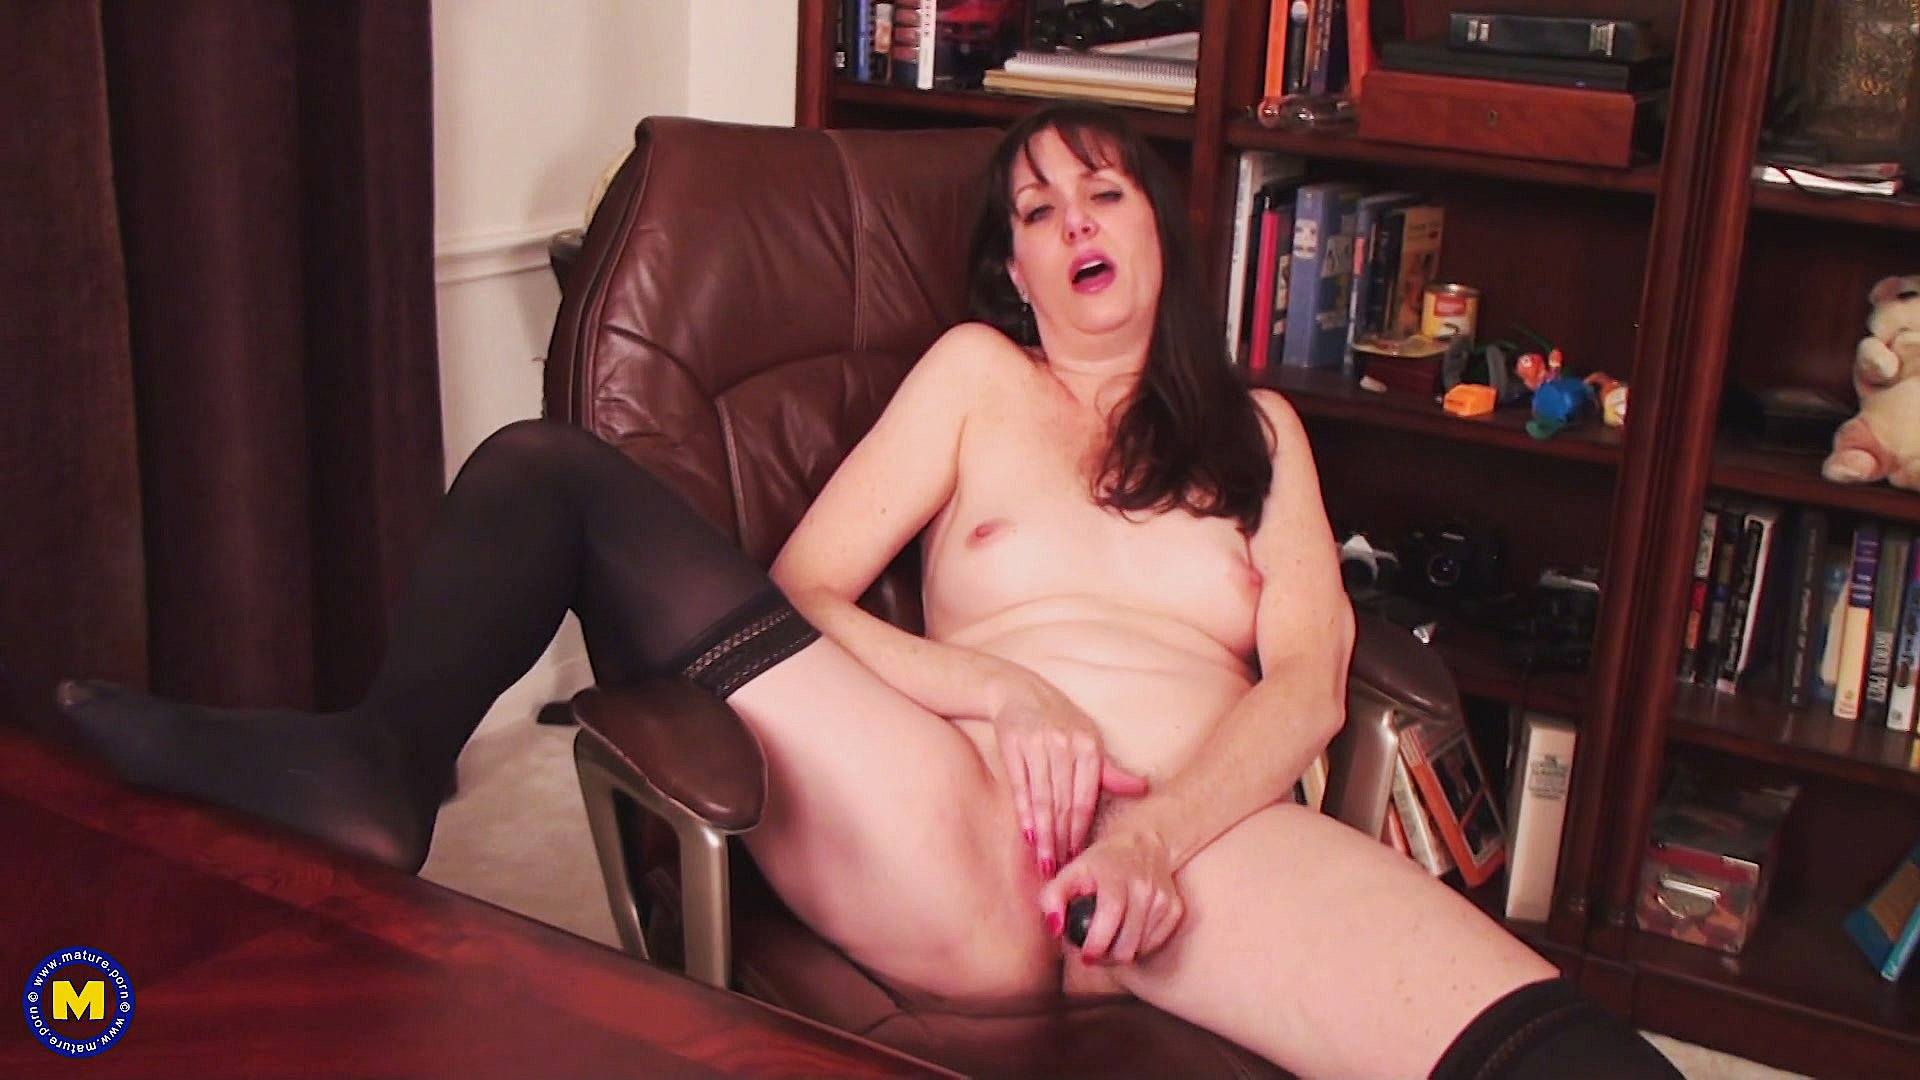 Porn Clip Lohan pussy upskirt